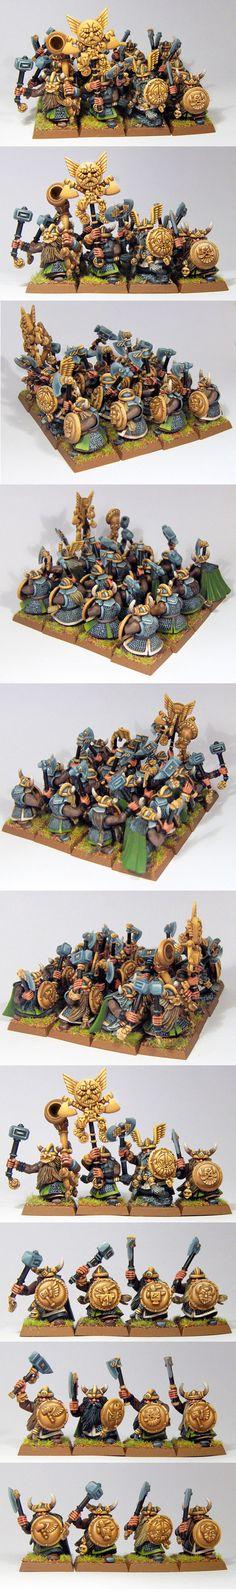 nain Fantasy Dwarf, Fantasy Battle, Warhammer Dwarfs, Figurines Warhammer, Model Hobbies, War Hammer, Fantasy Miniatures, Warhammer Fantasy, Furry Art